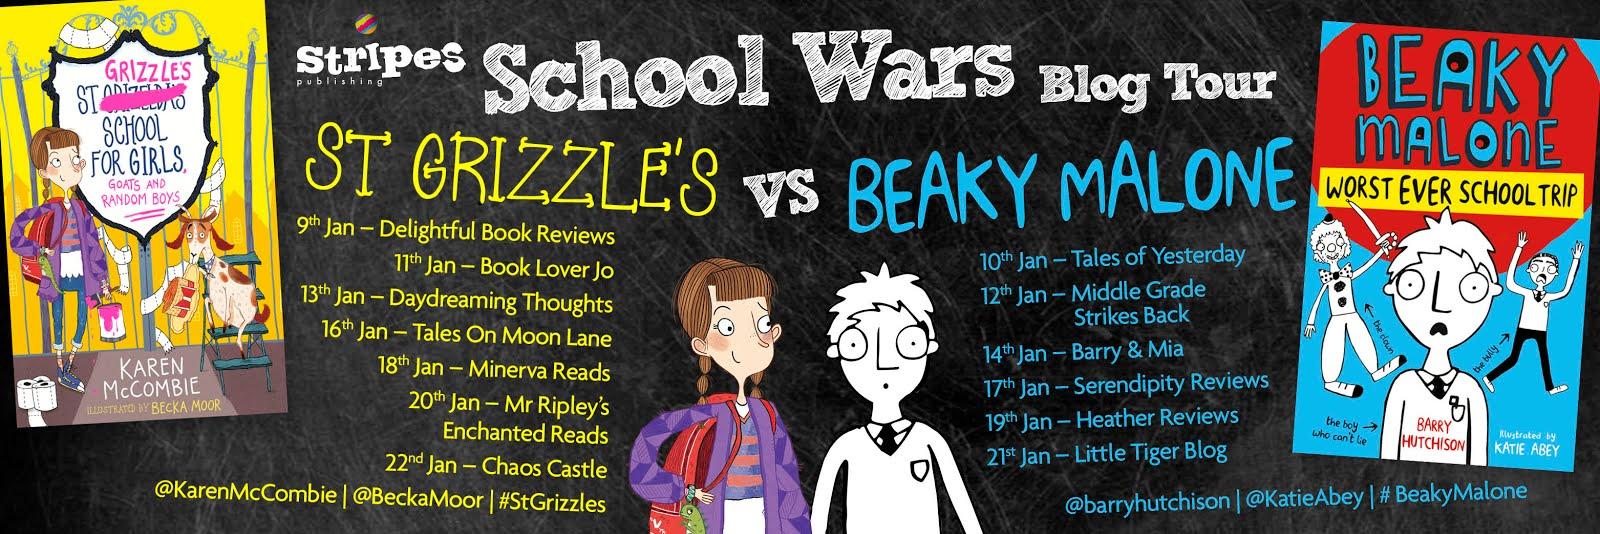 School Wars Blog Tour